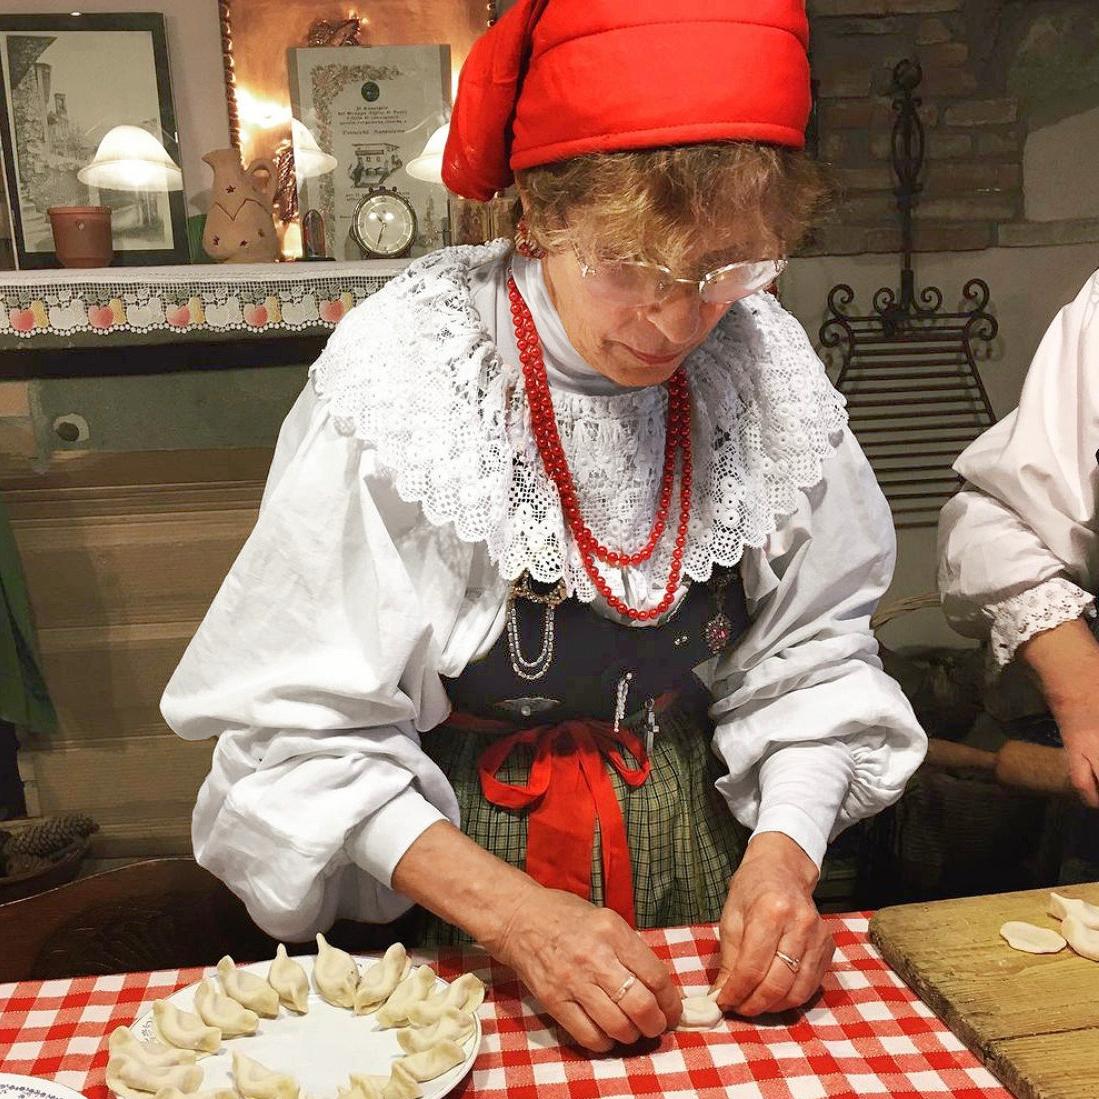 older woman traditional dirndl dress hat preparing dumplings